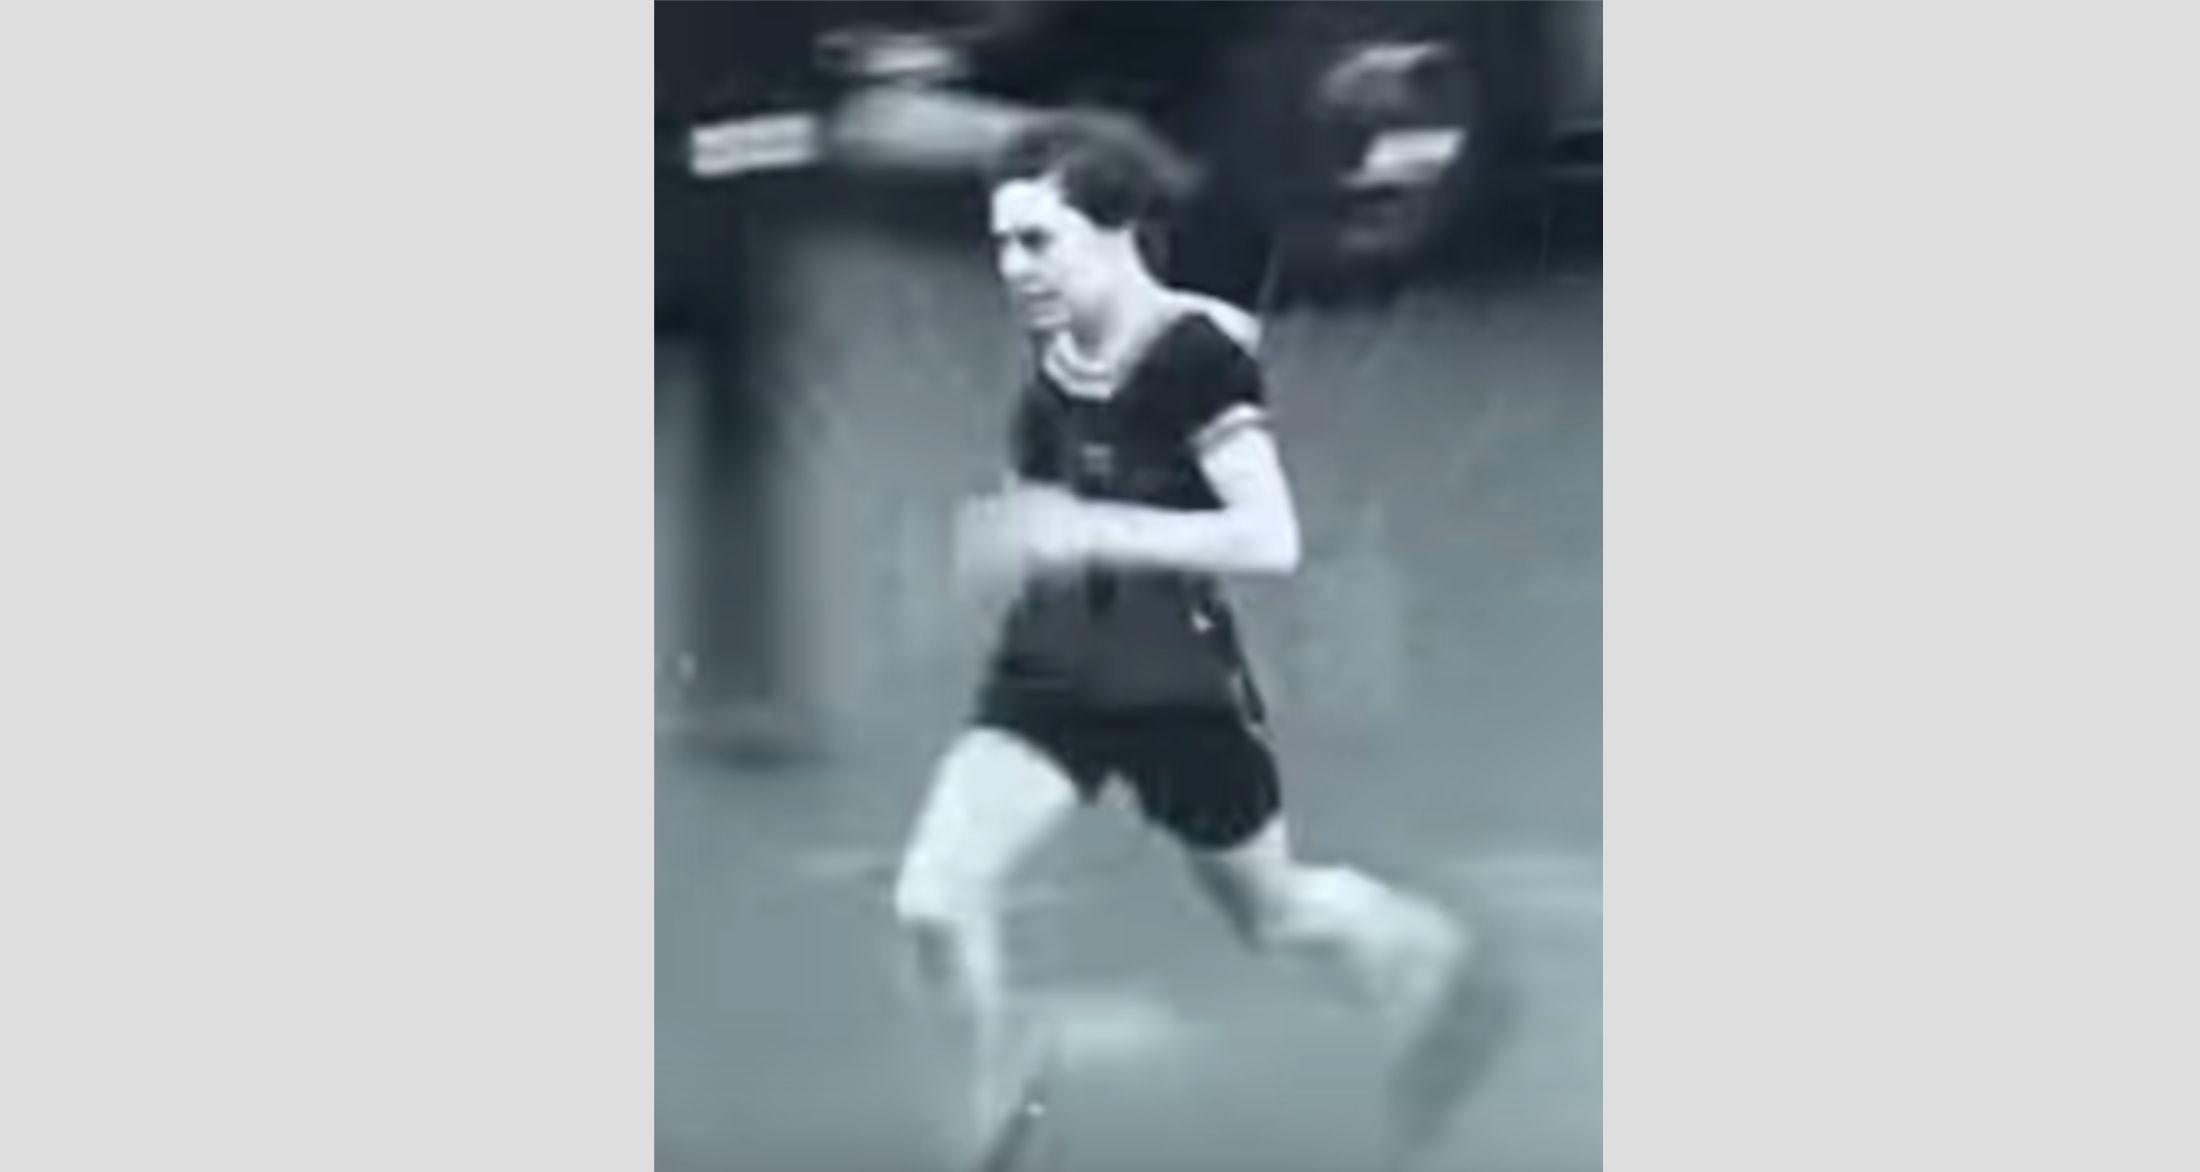 Florence Ilott's remarkable 1934 achievement has been memorialised in a heartwarming Twitter